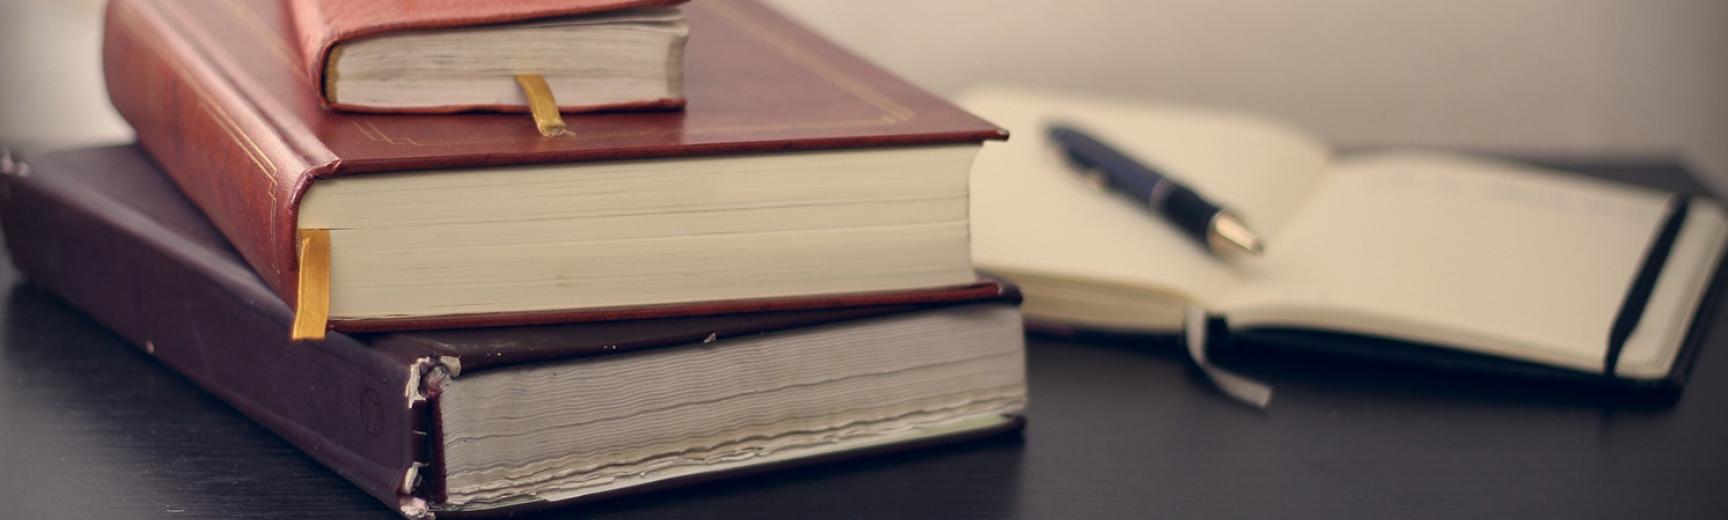 books 690219